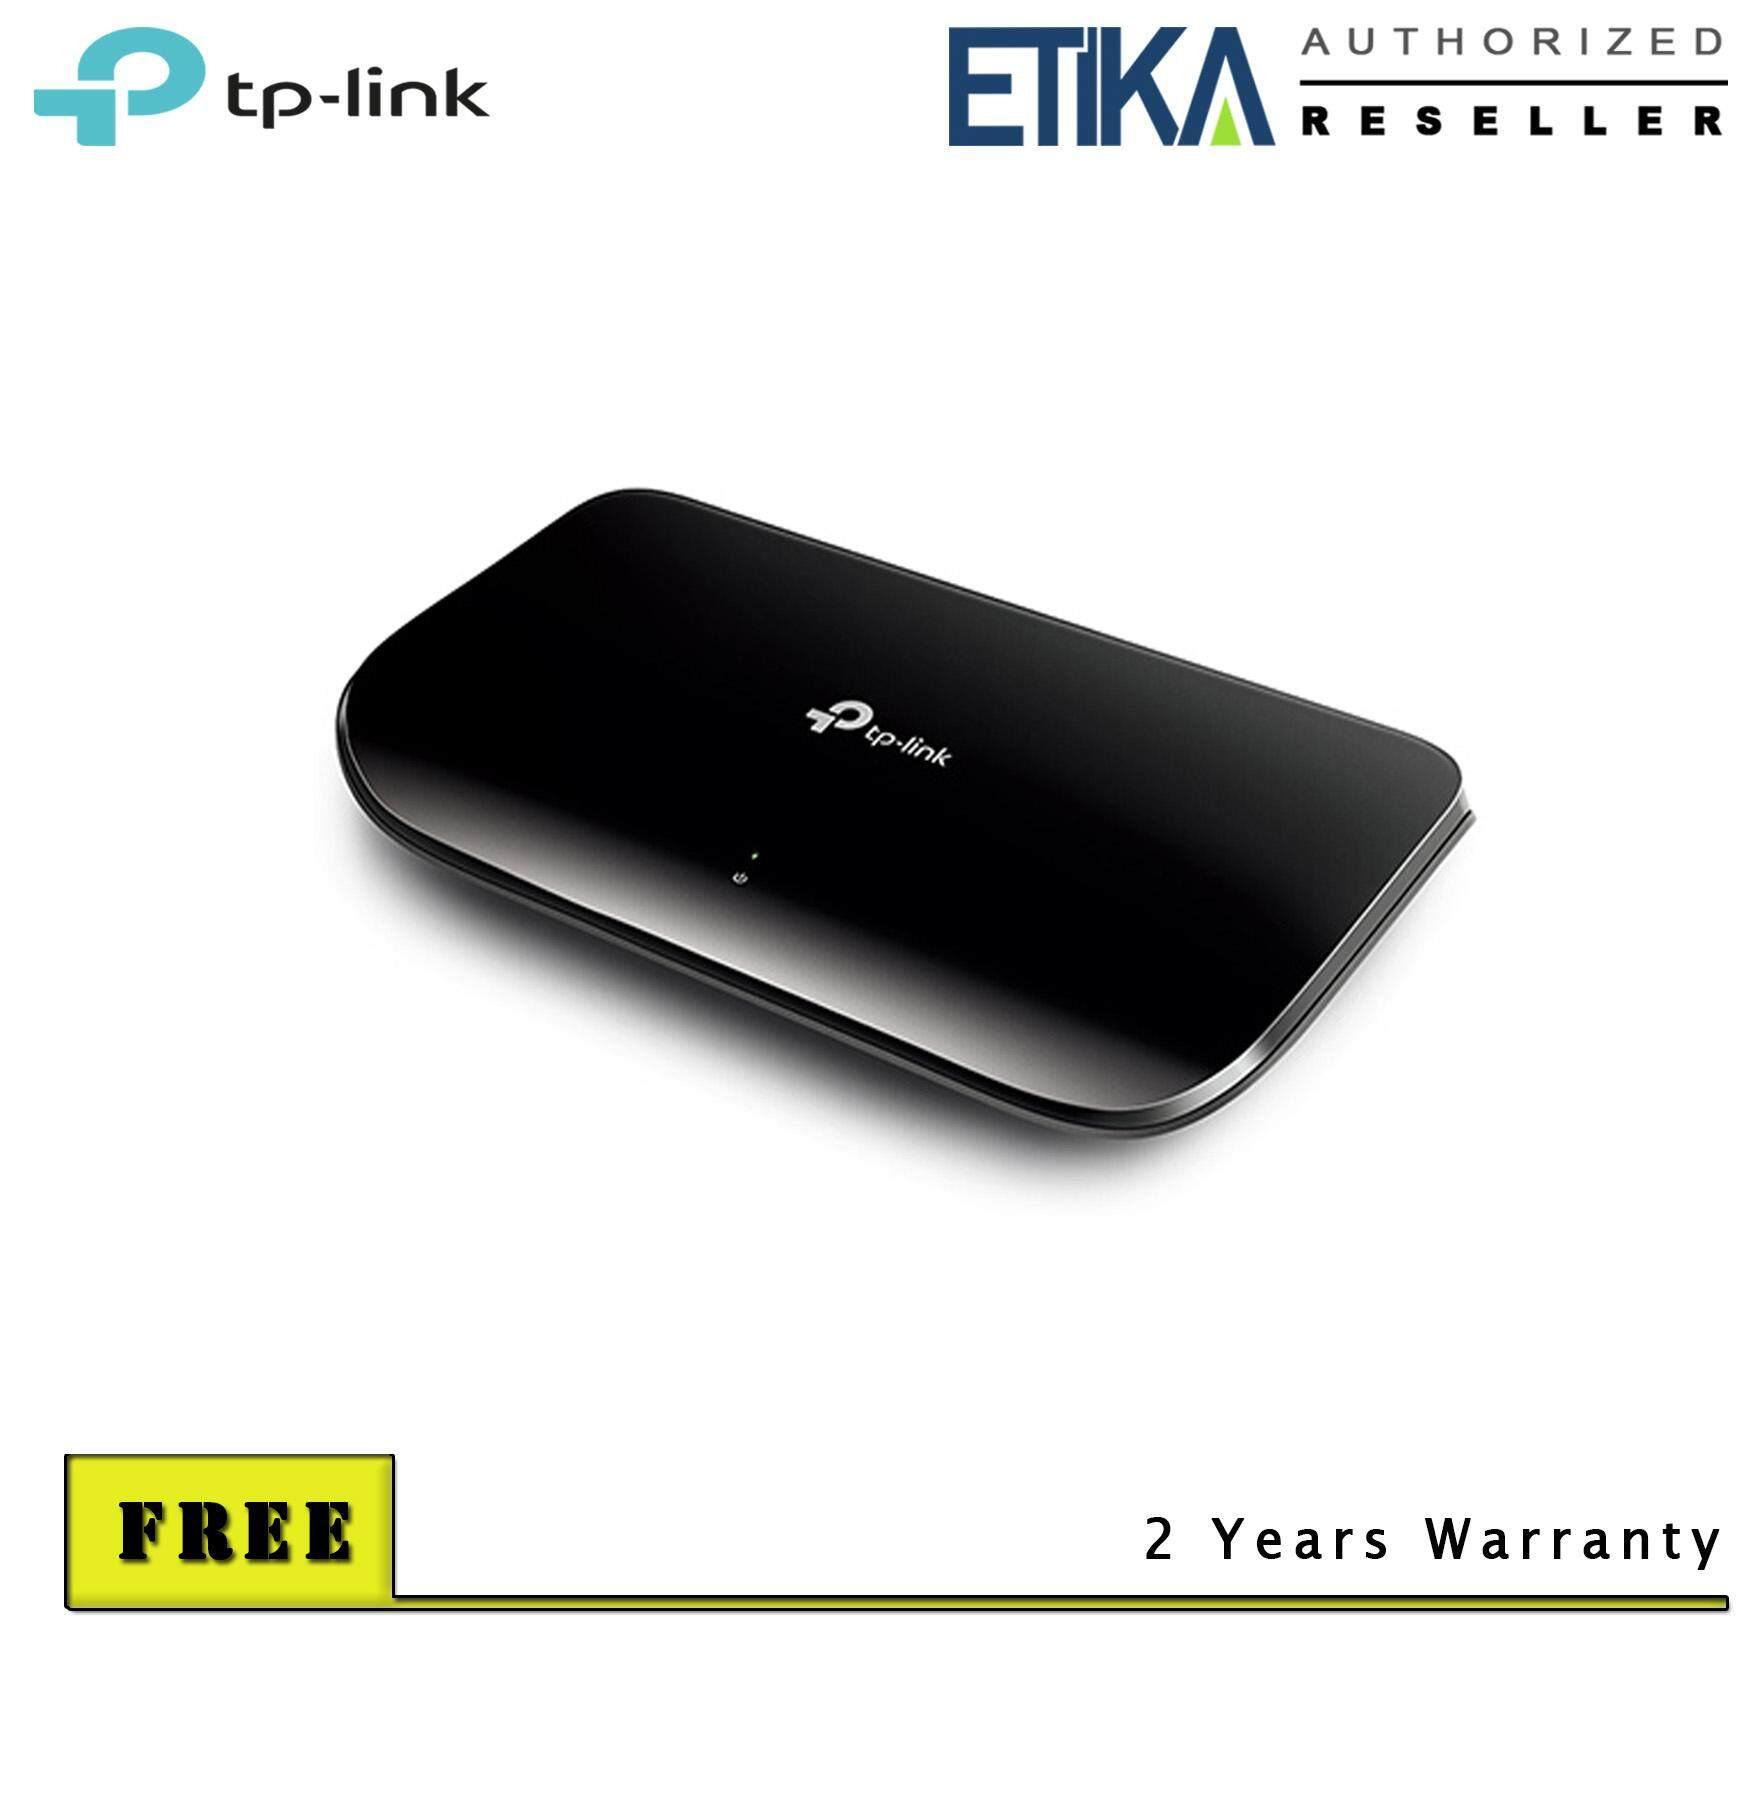 Etika Komputer Buy At Best Price In Malaysia Www Tp Link 8 Port Gigabit Desktop Switch Tl Sg1008d